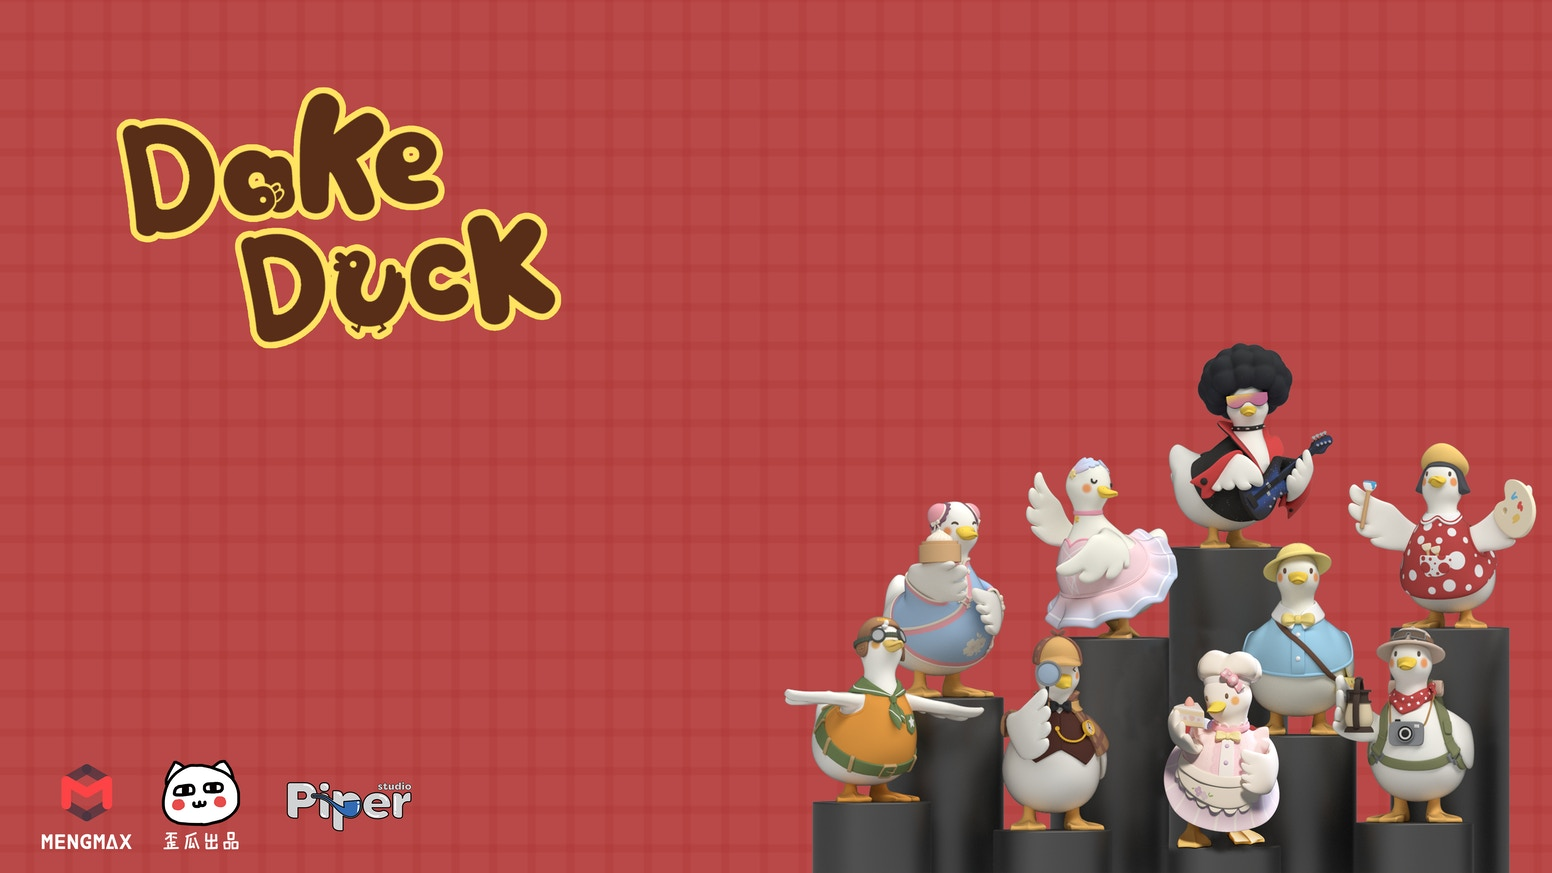 Dake Duck series art toys